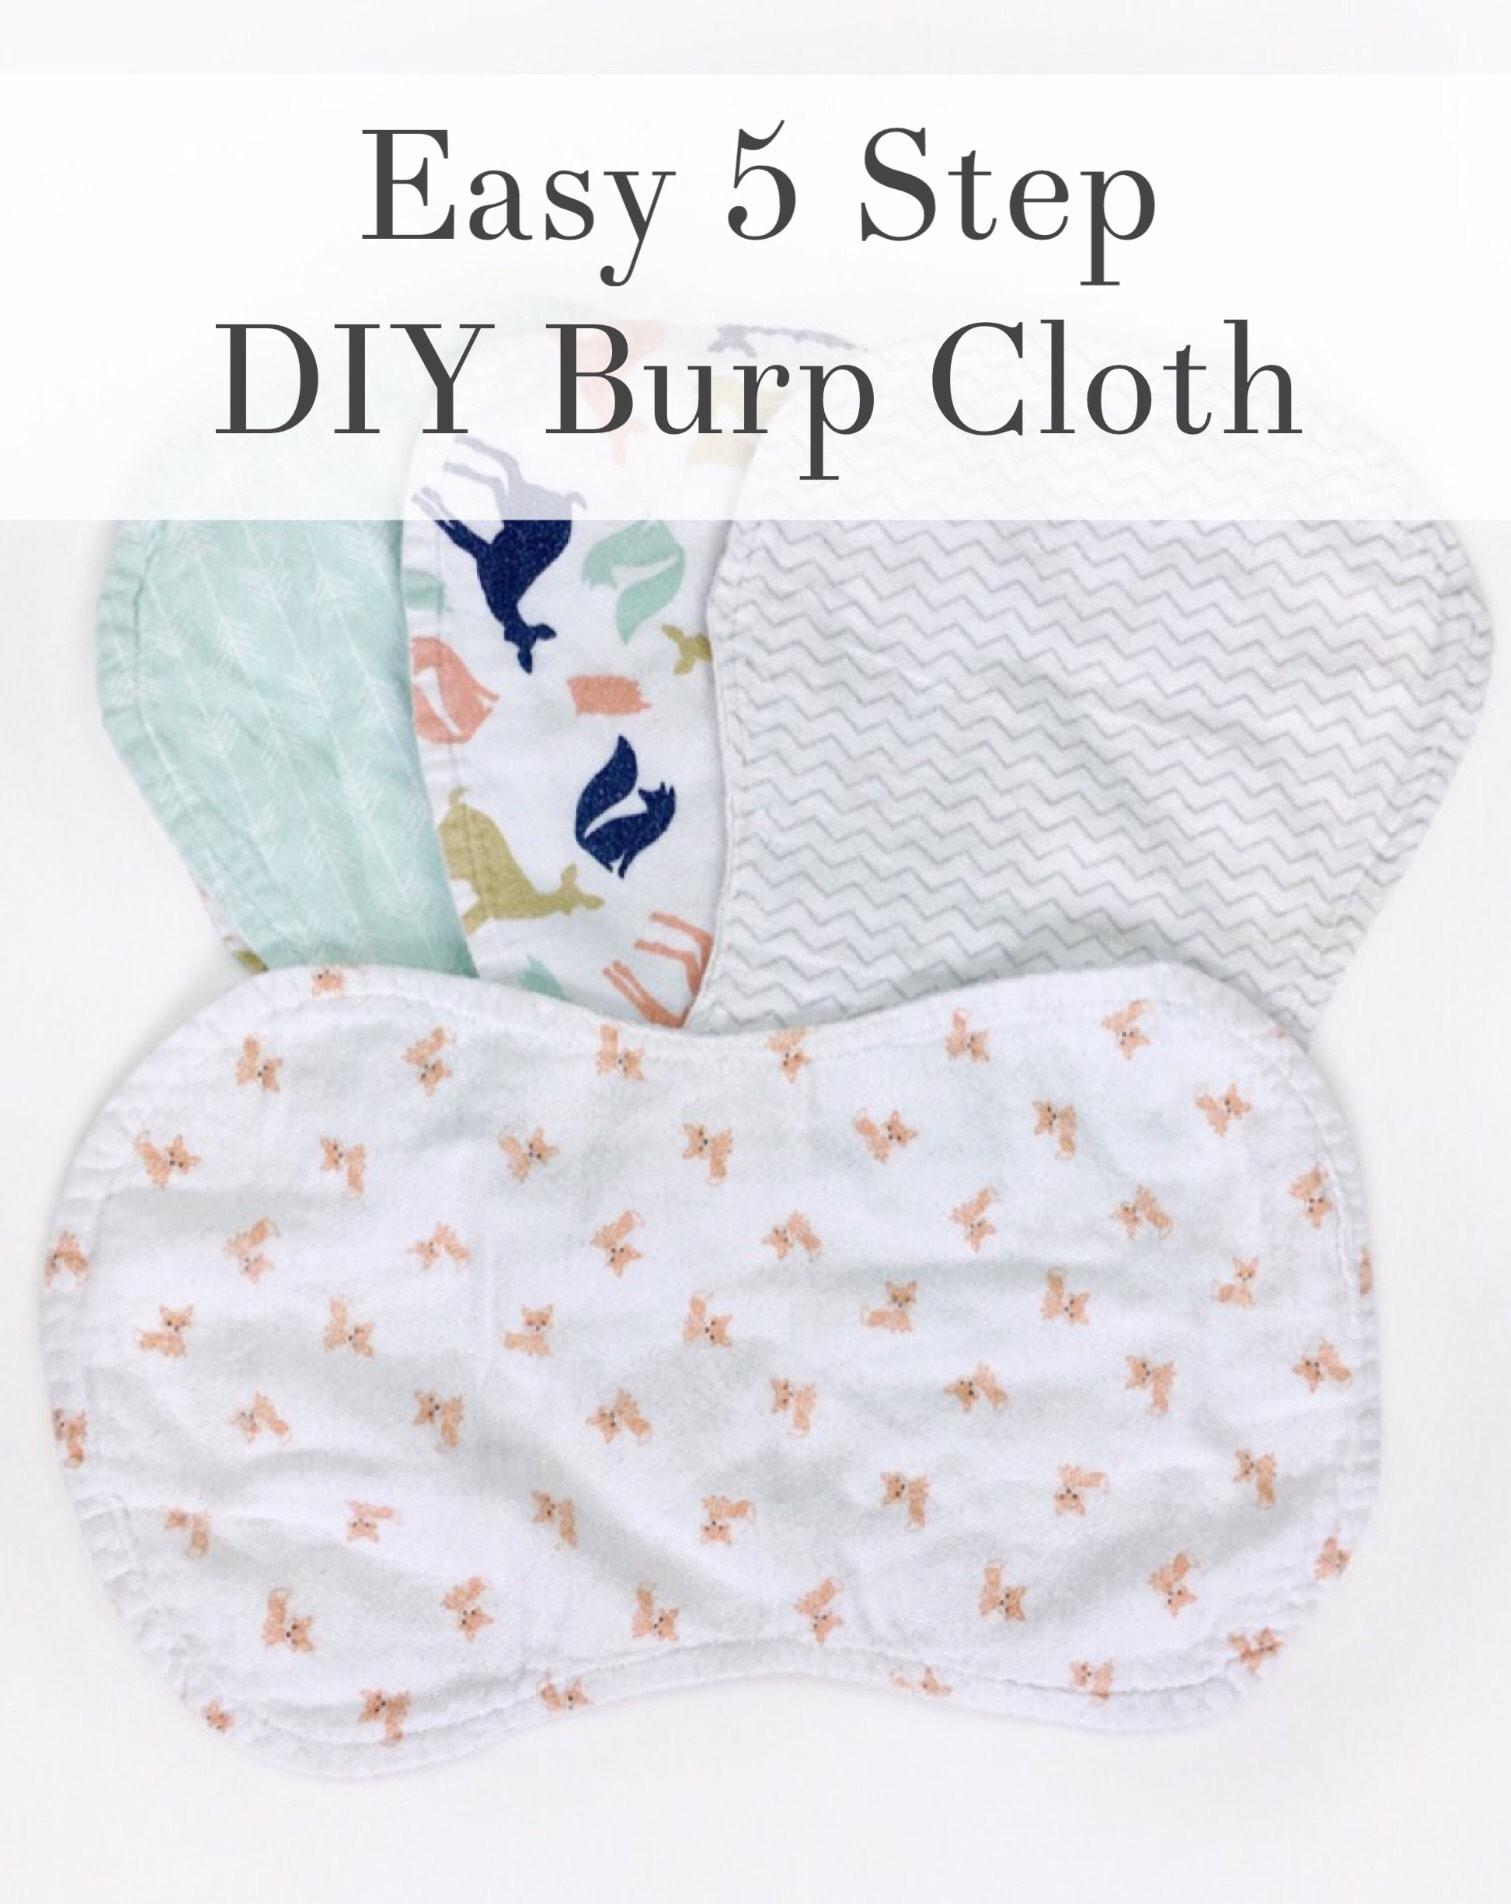 Easy 5 Step Diy Burp Cloth Burp Rag Cassie Scroggins